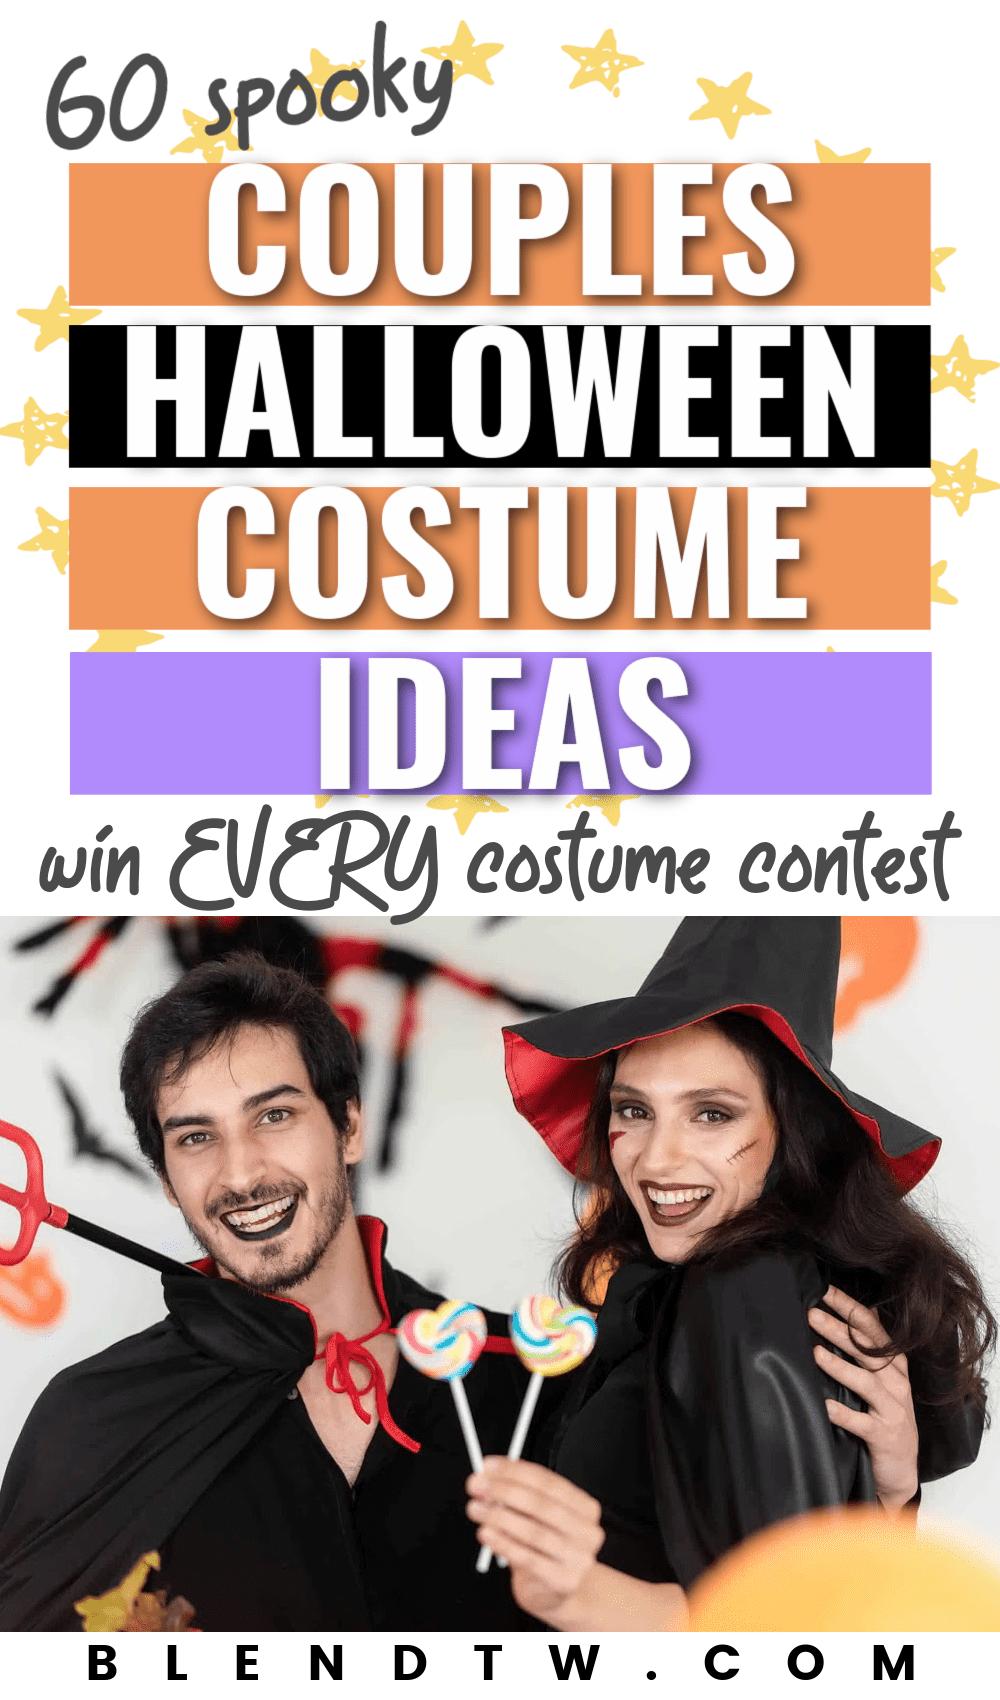 60 spooky couples halloween costume ideas